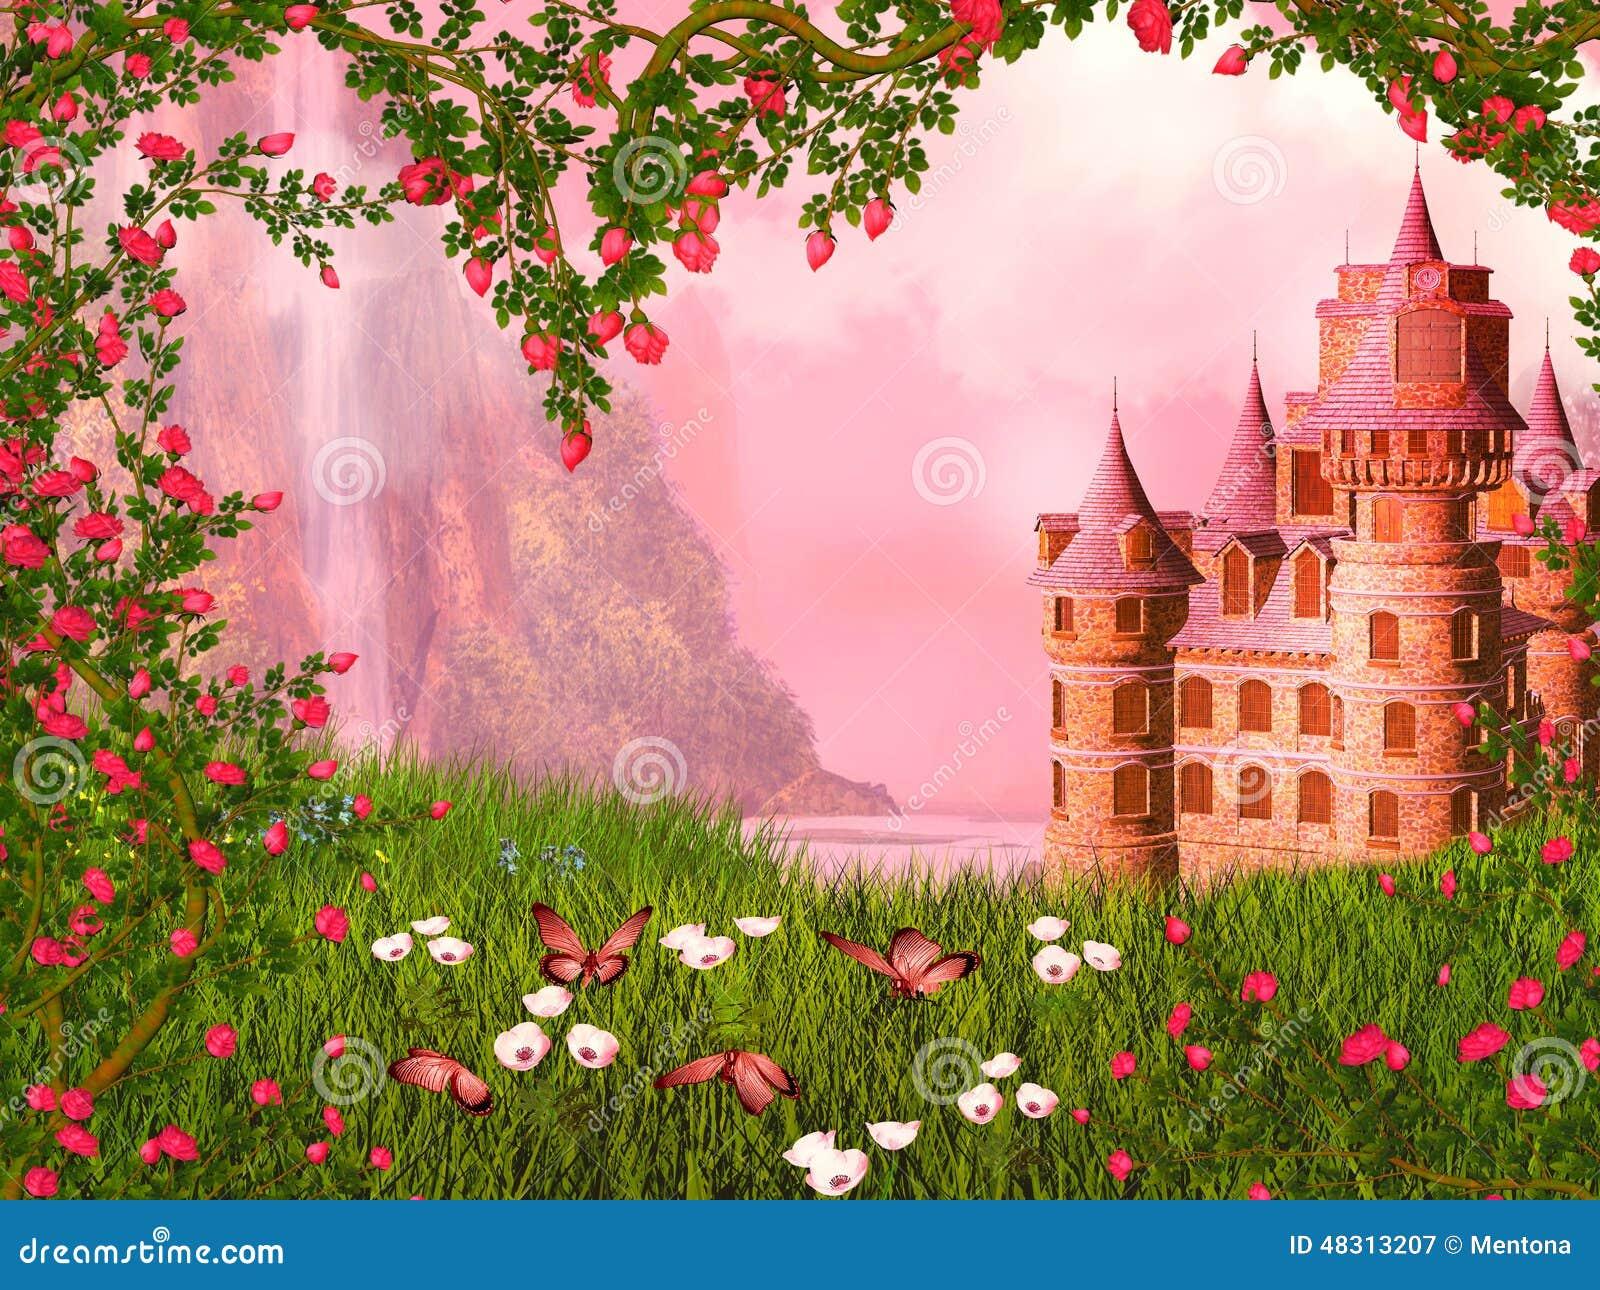 Landscape Illustration Vector Free: Fairy Tale Landscape Stock Illustration. Image Of Princess